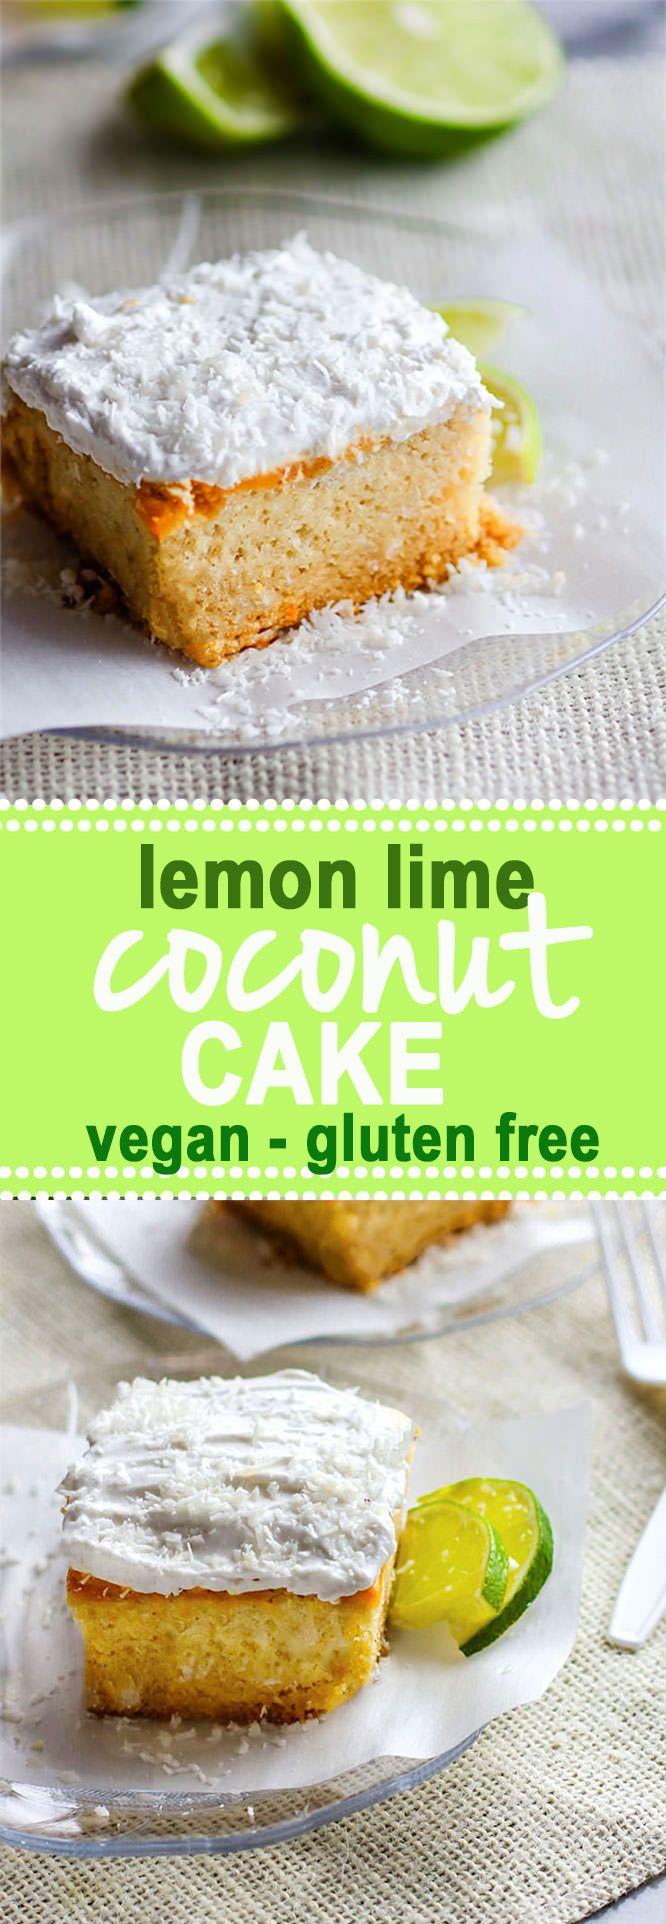 Manna Cake - The Simplest Recipes 44